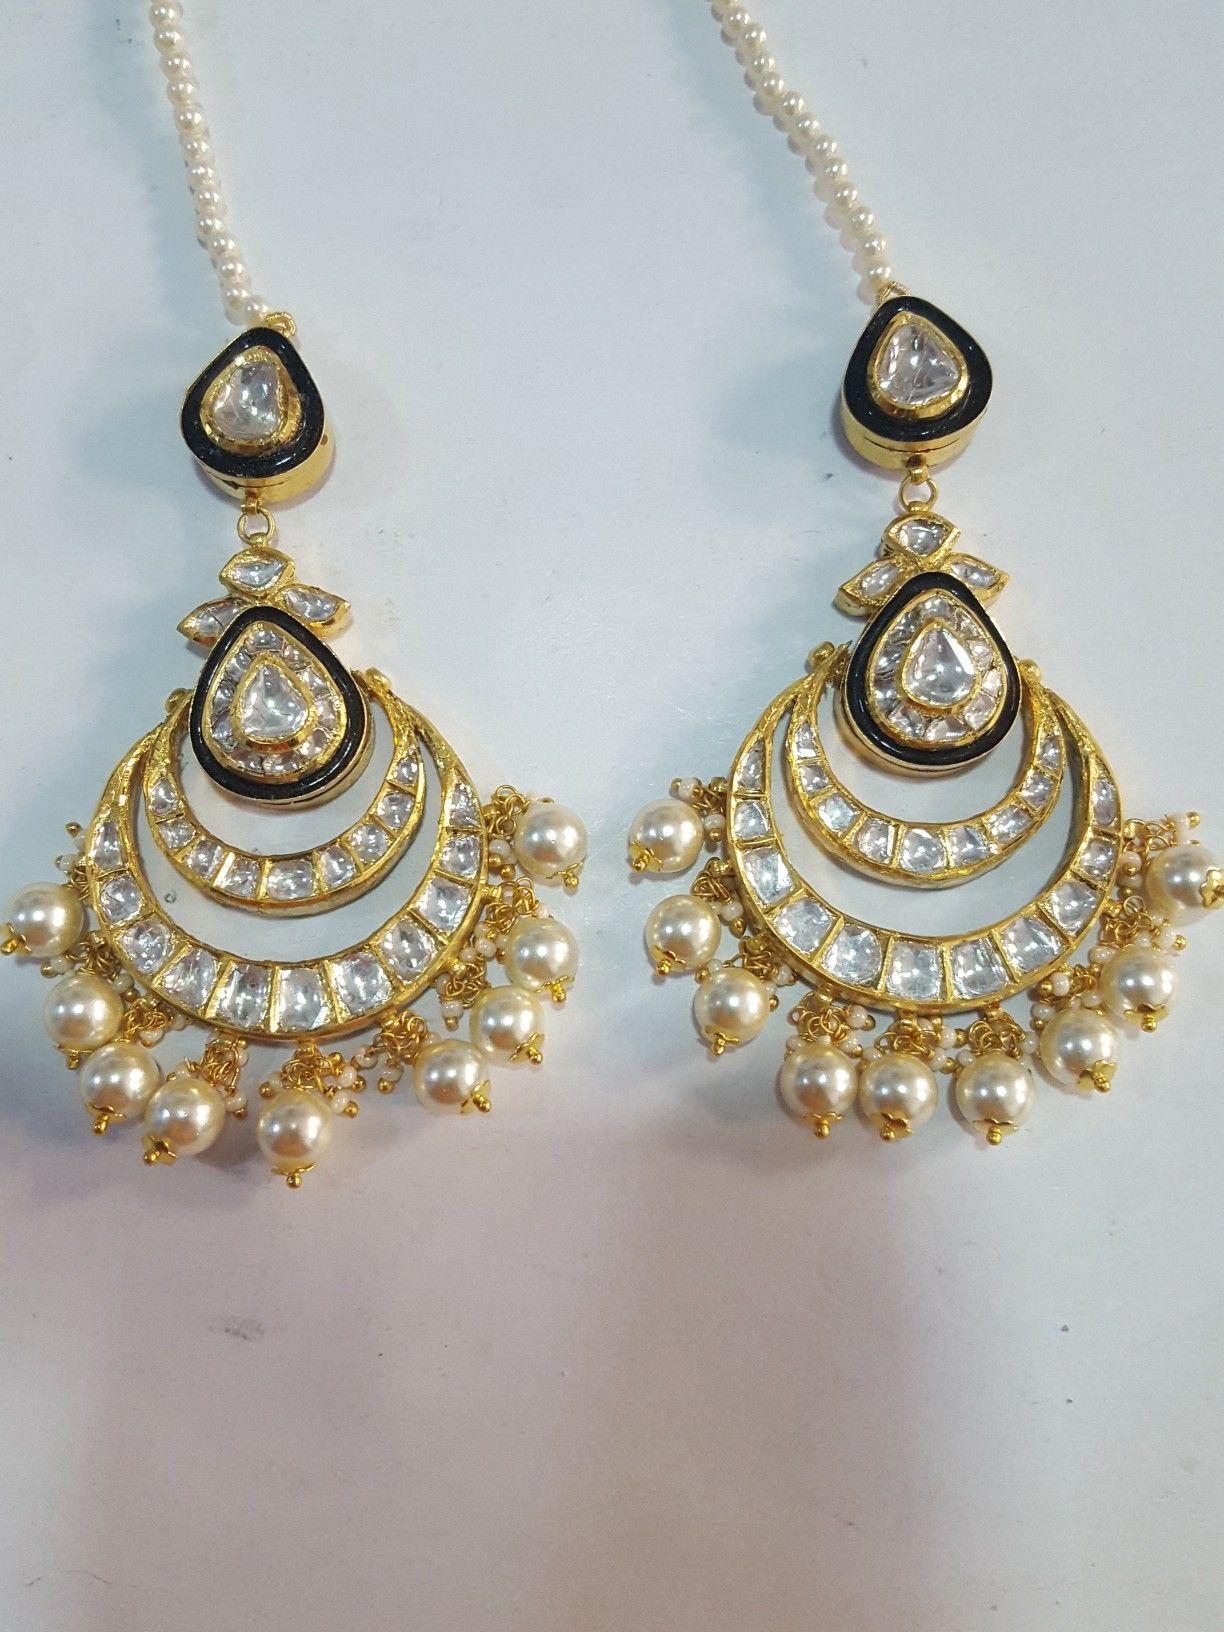 9f66ea3dd57a7 kundan meena polki chandbali | jadau jewellery in 2019 | Jewelry ...